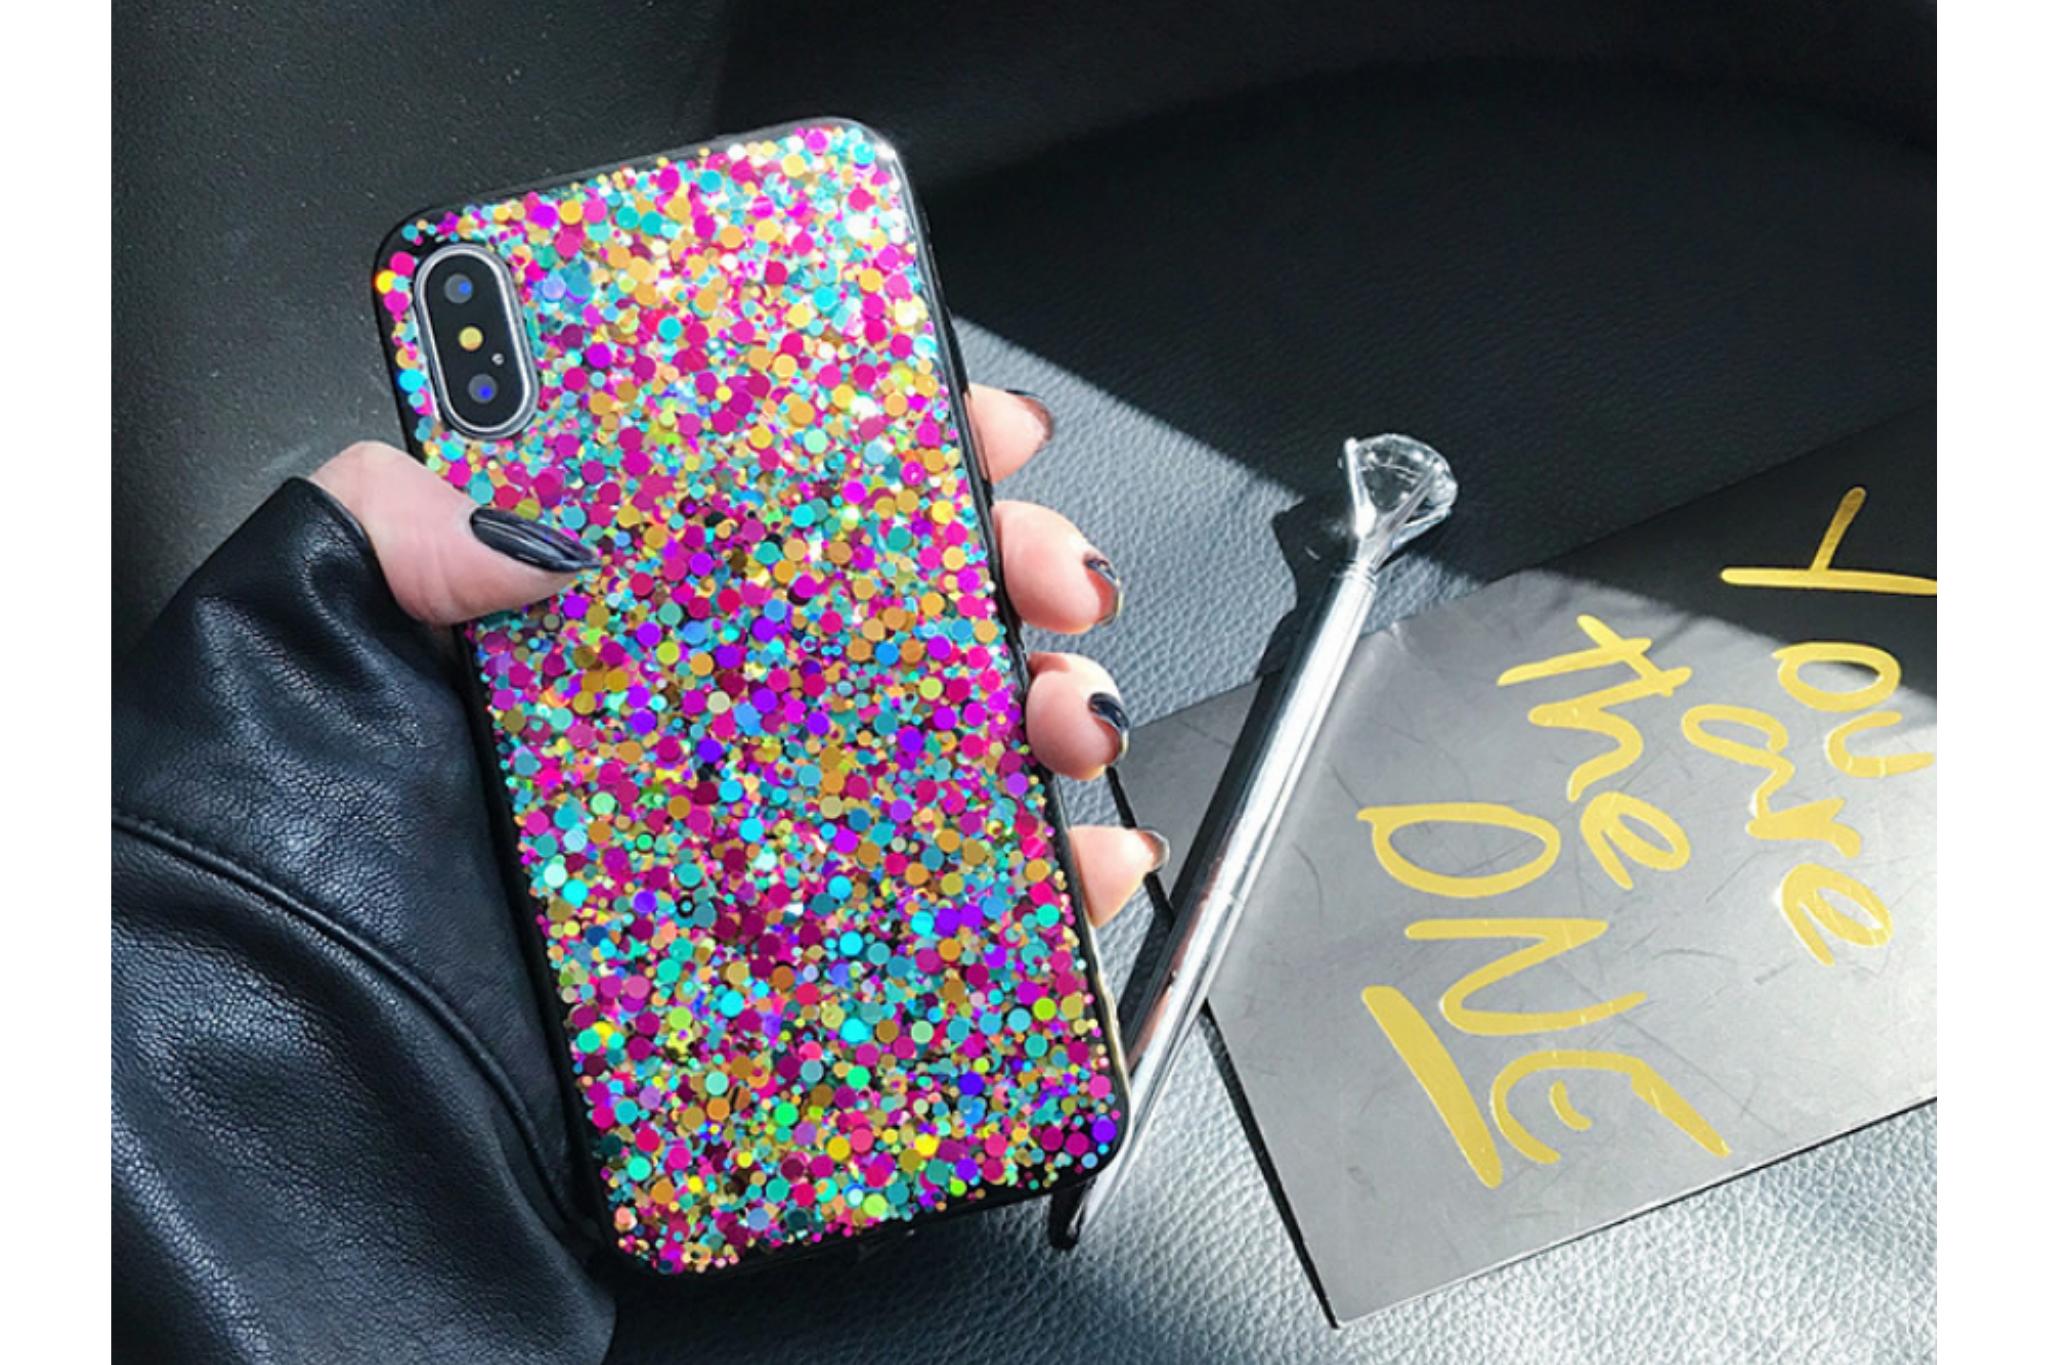 Smartphonehoesje iPhone 6s   Bling (glitter)   Multicolor